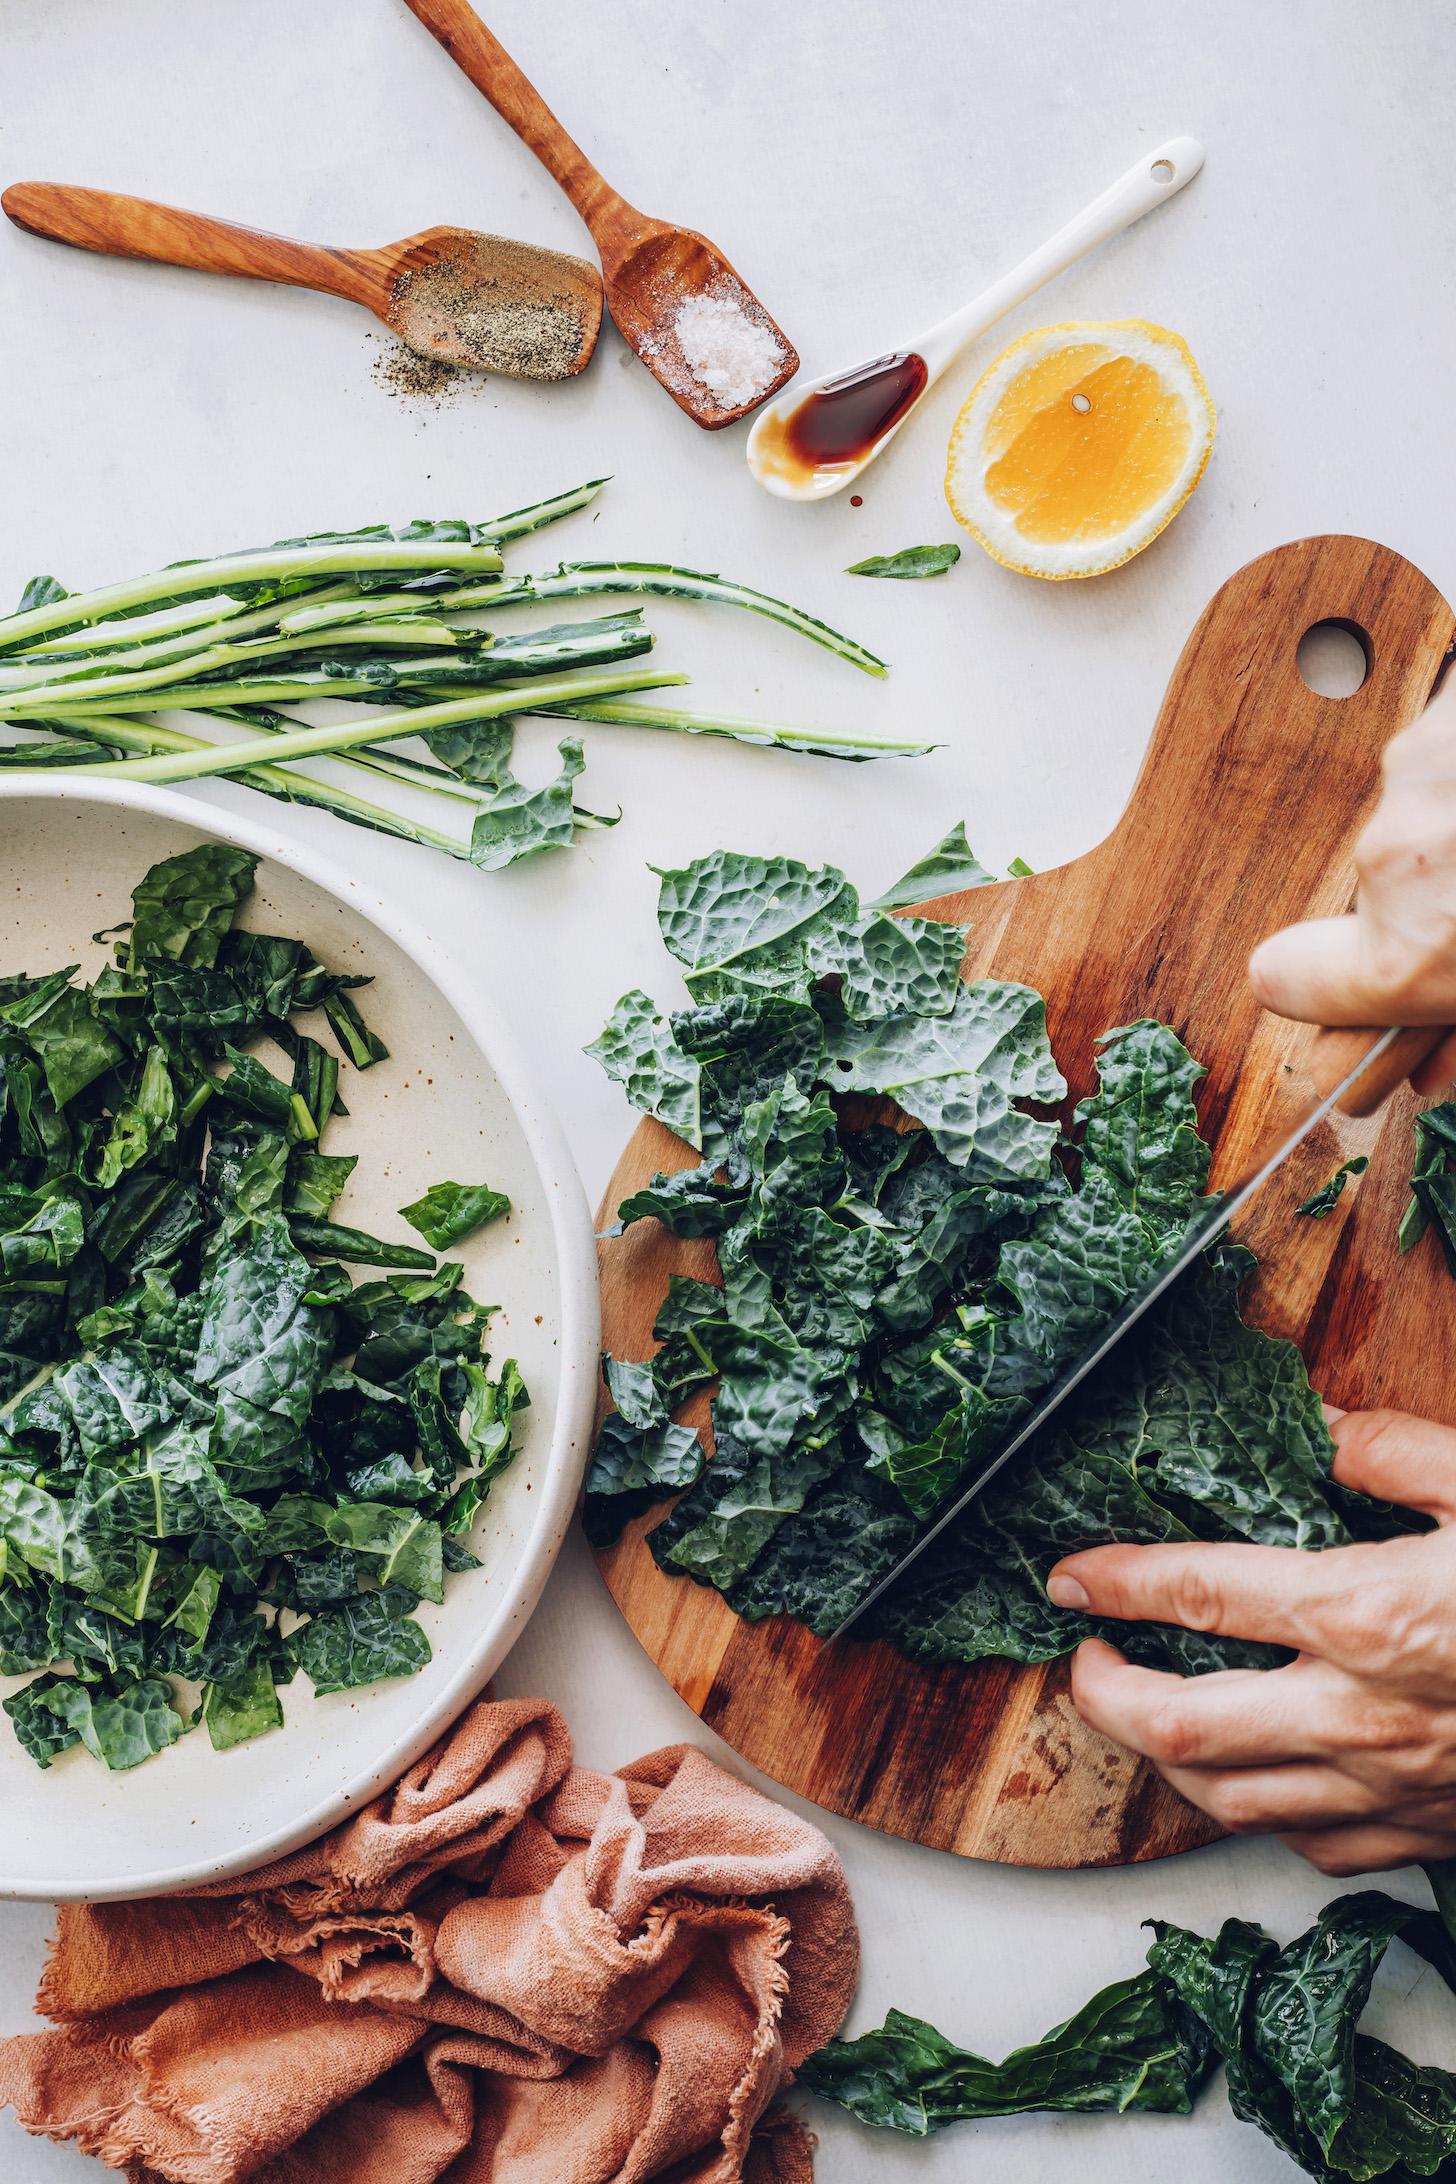 Slicing kale on a cutting board